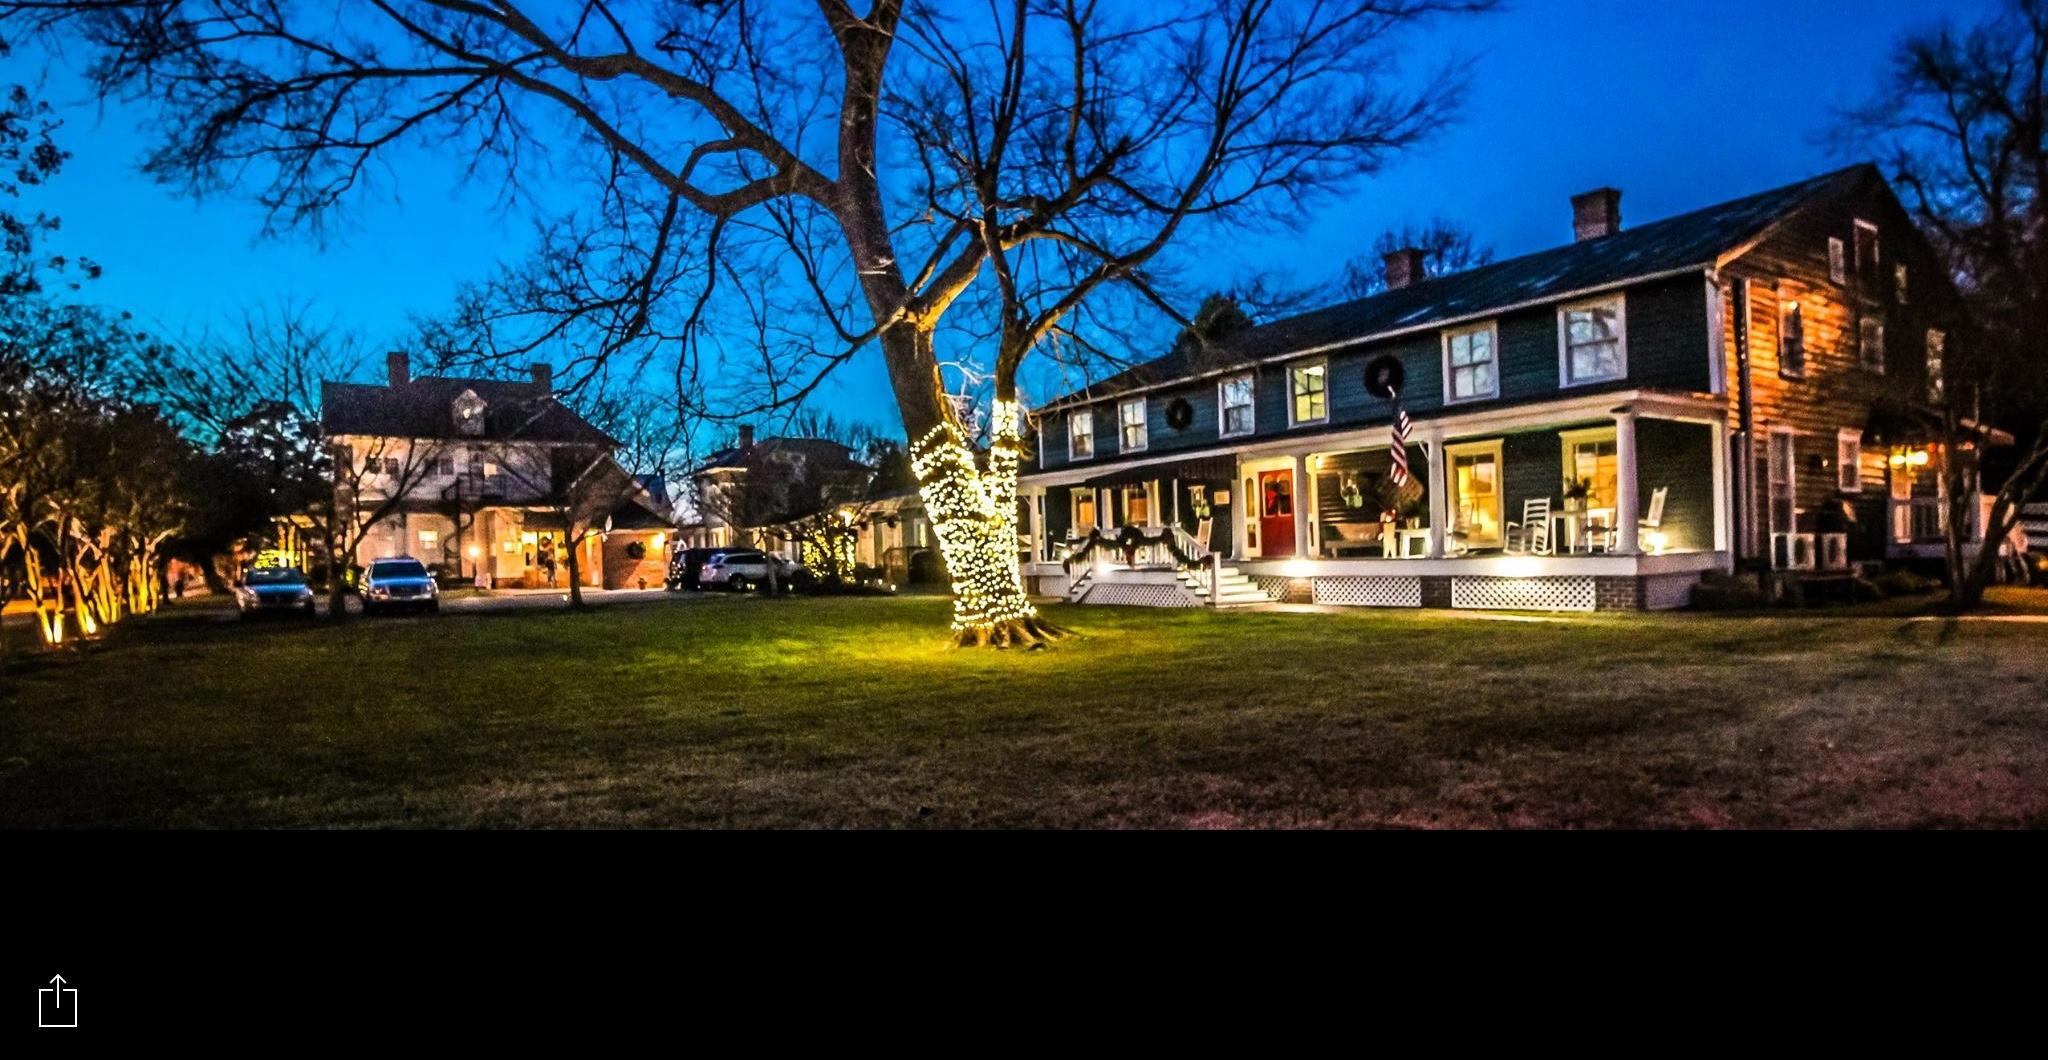 Evening time at our Edenton, North Carolina Hotel